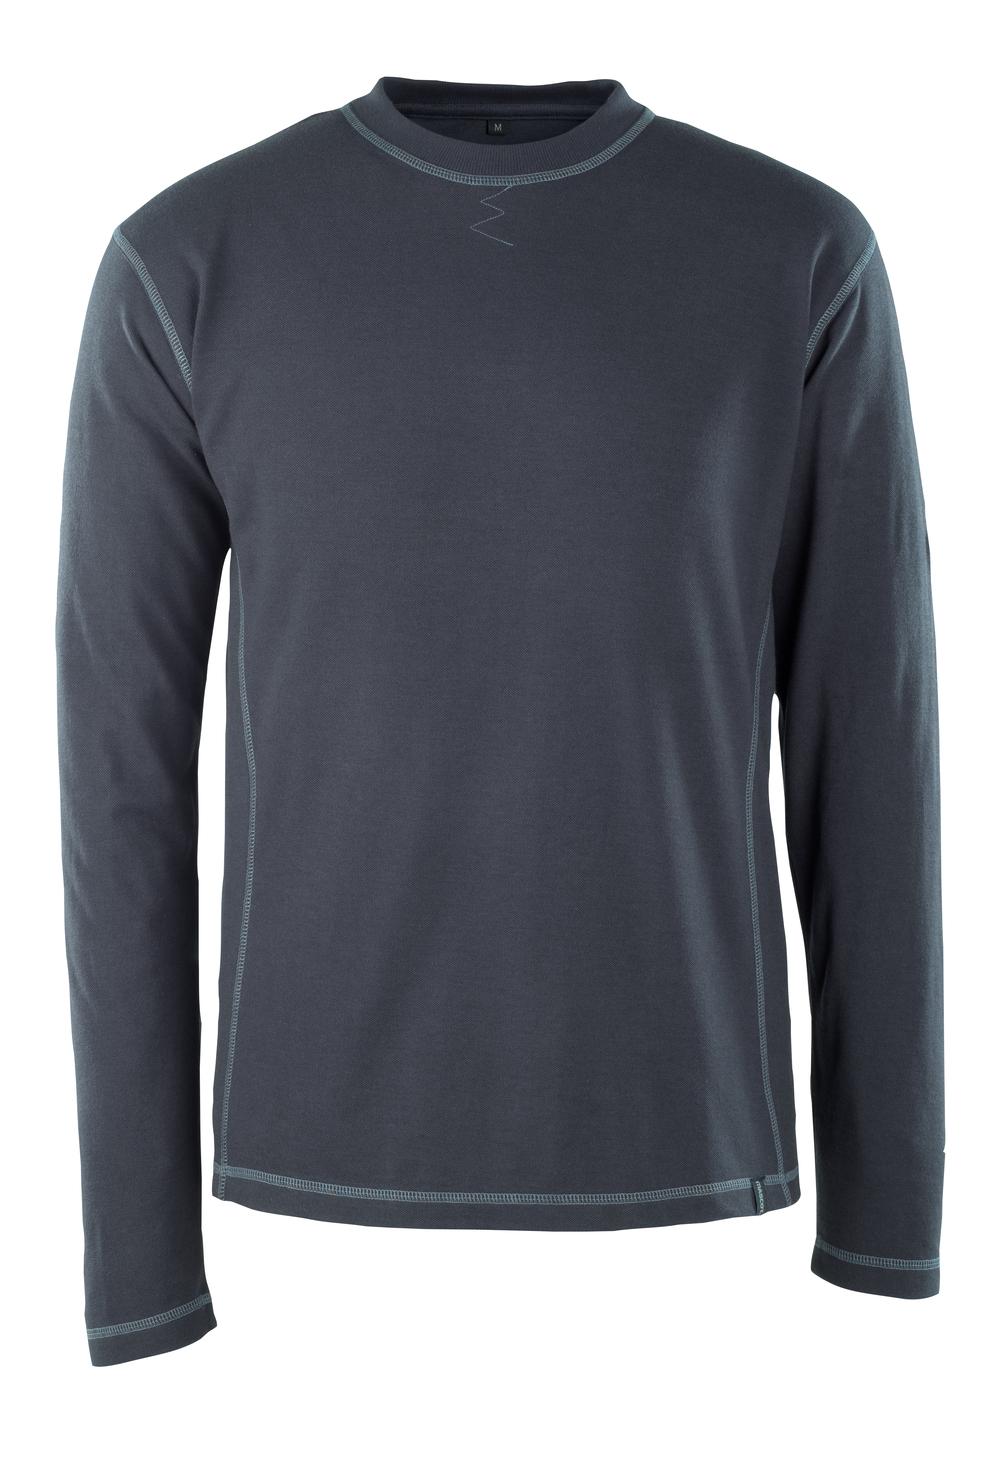 50119-927-010 Langarm T-Shirt - Schwarzblau